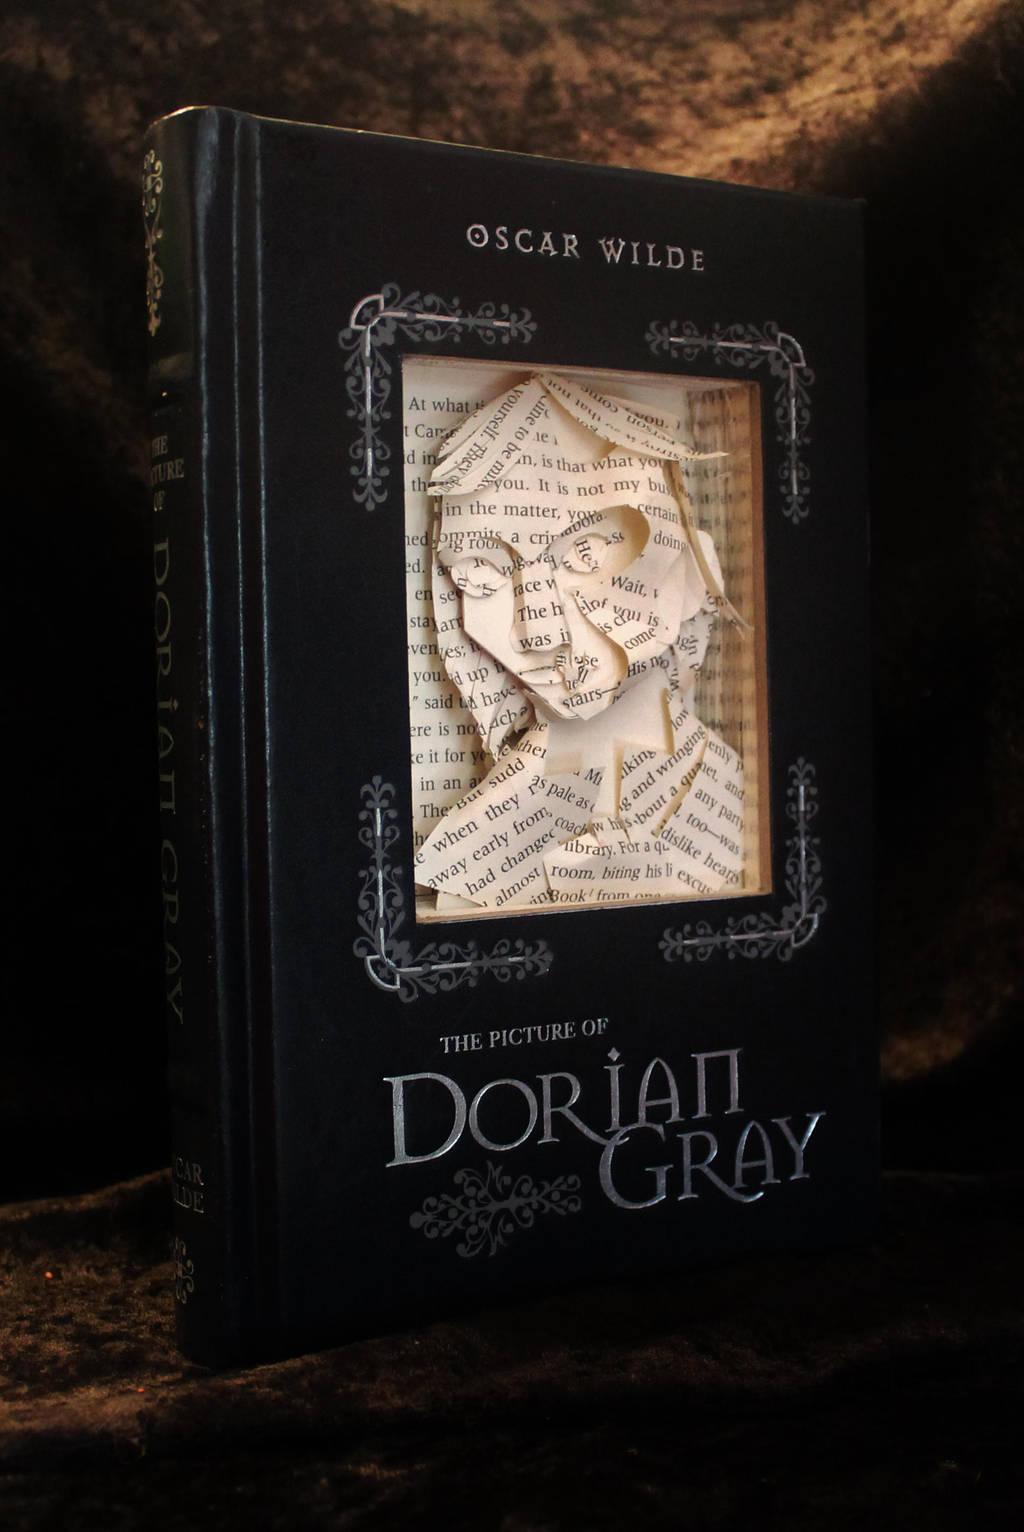 the_portrait_of_dorian_gray_book_sculpture_by_wetcanvas_d5xczlj-fullview.jpg